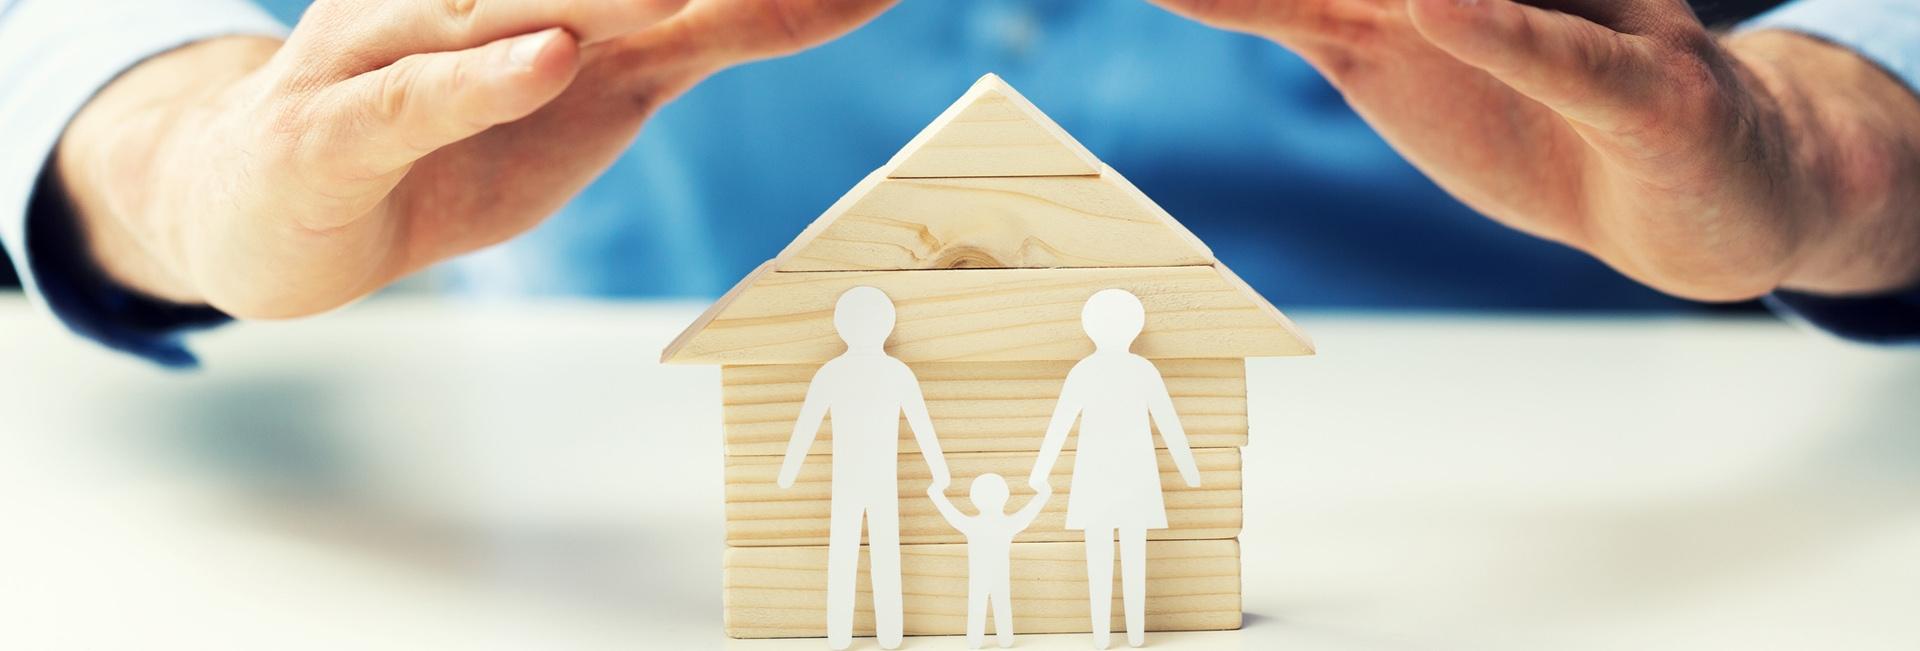 entreprise-protection-sociale-ok